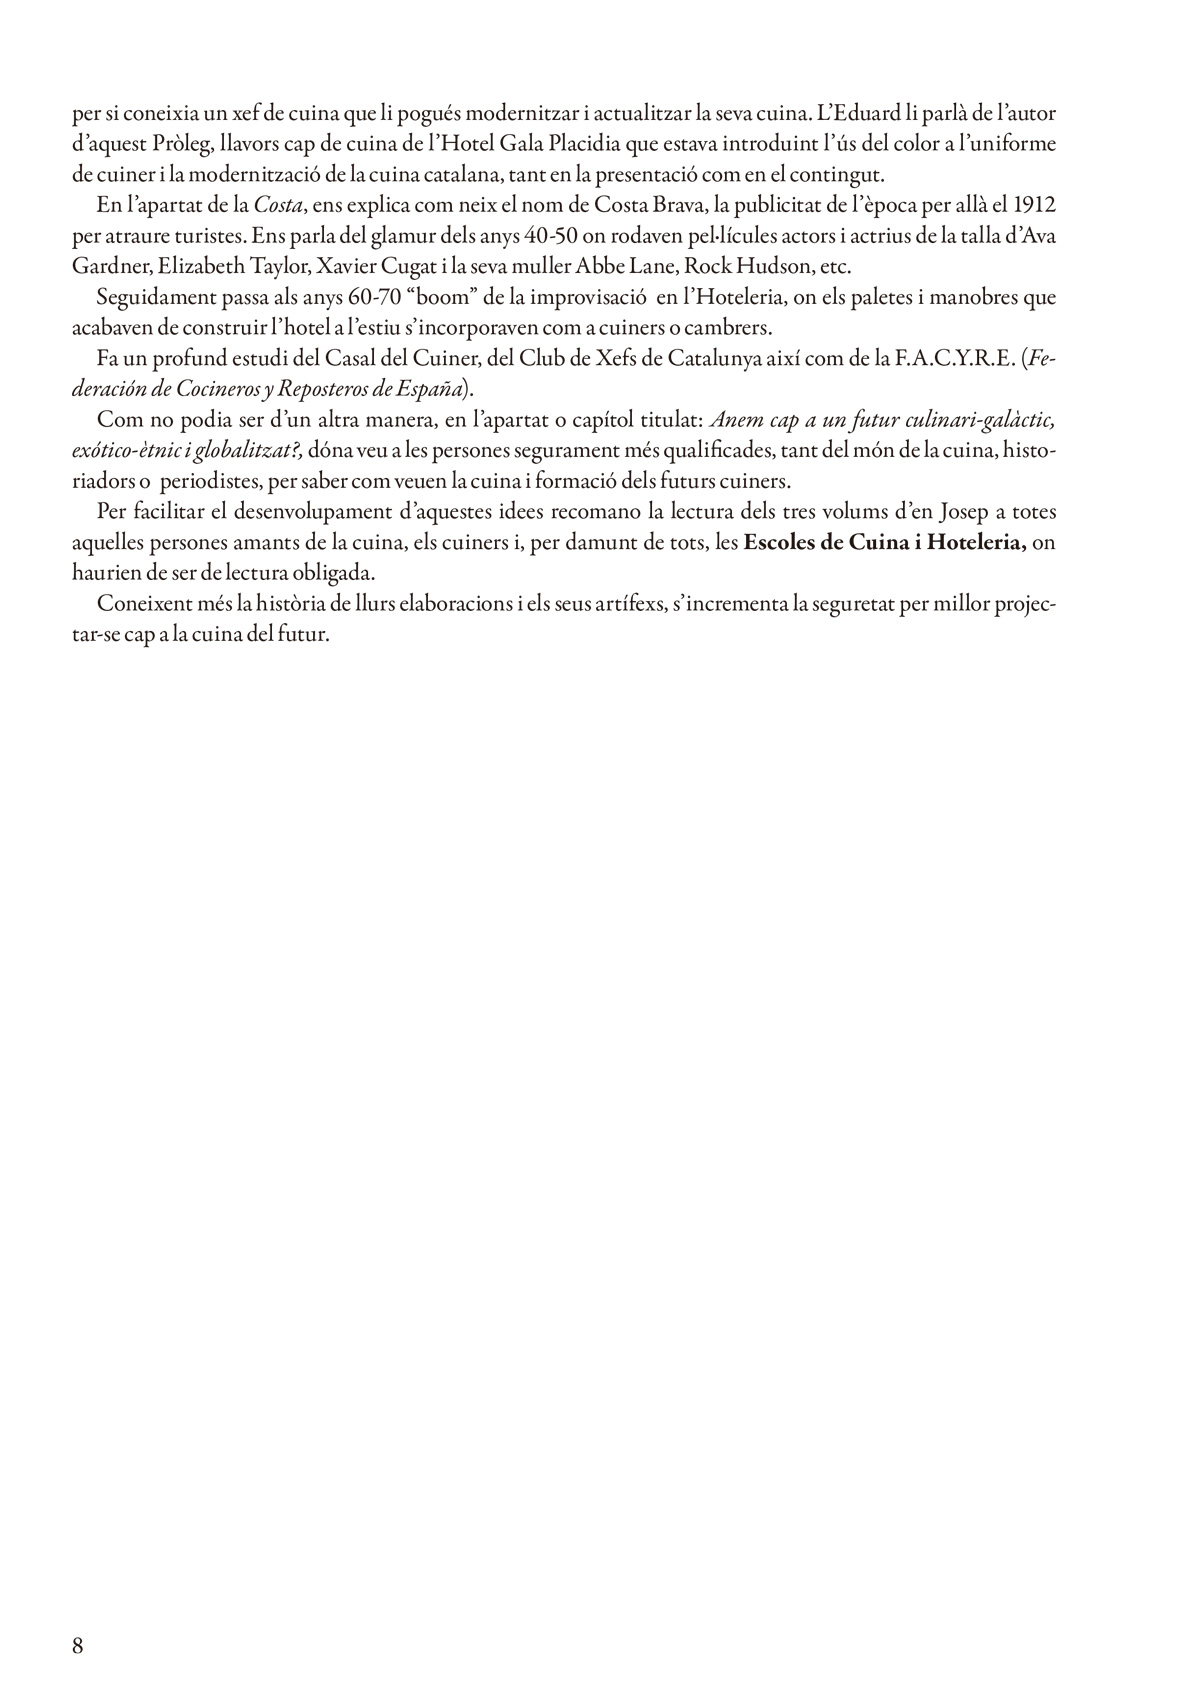 Pròleg volum III Josep Bullich i Gaspar - Cuina i Cuiners a Catalunya